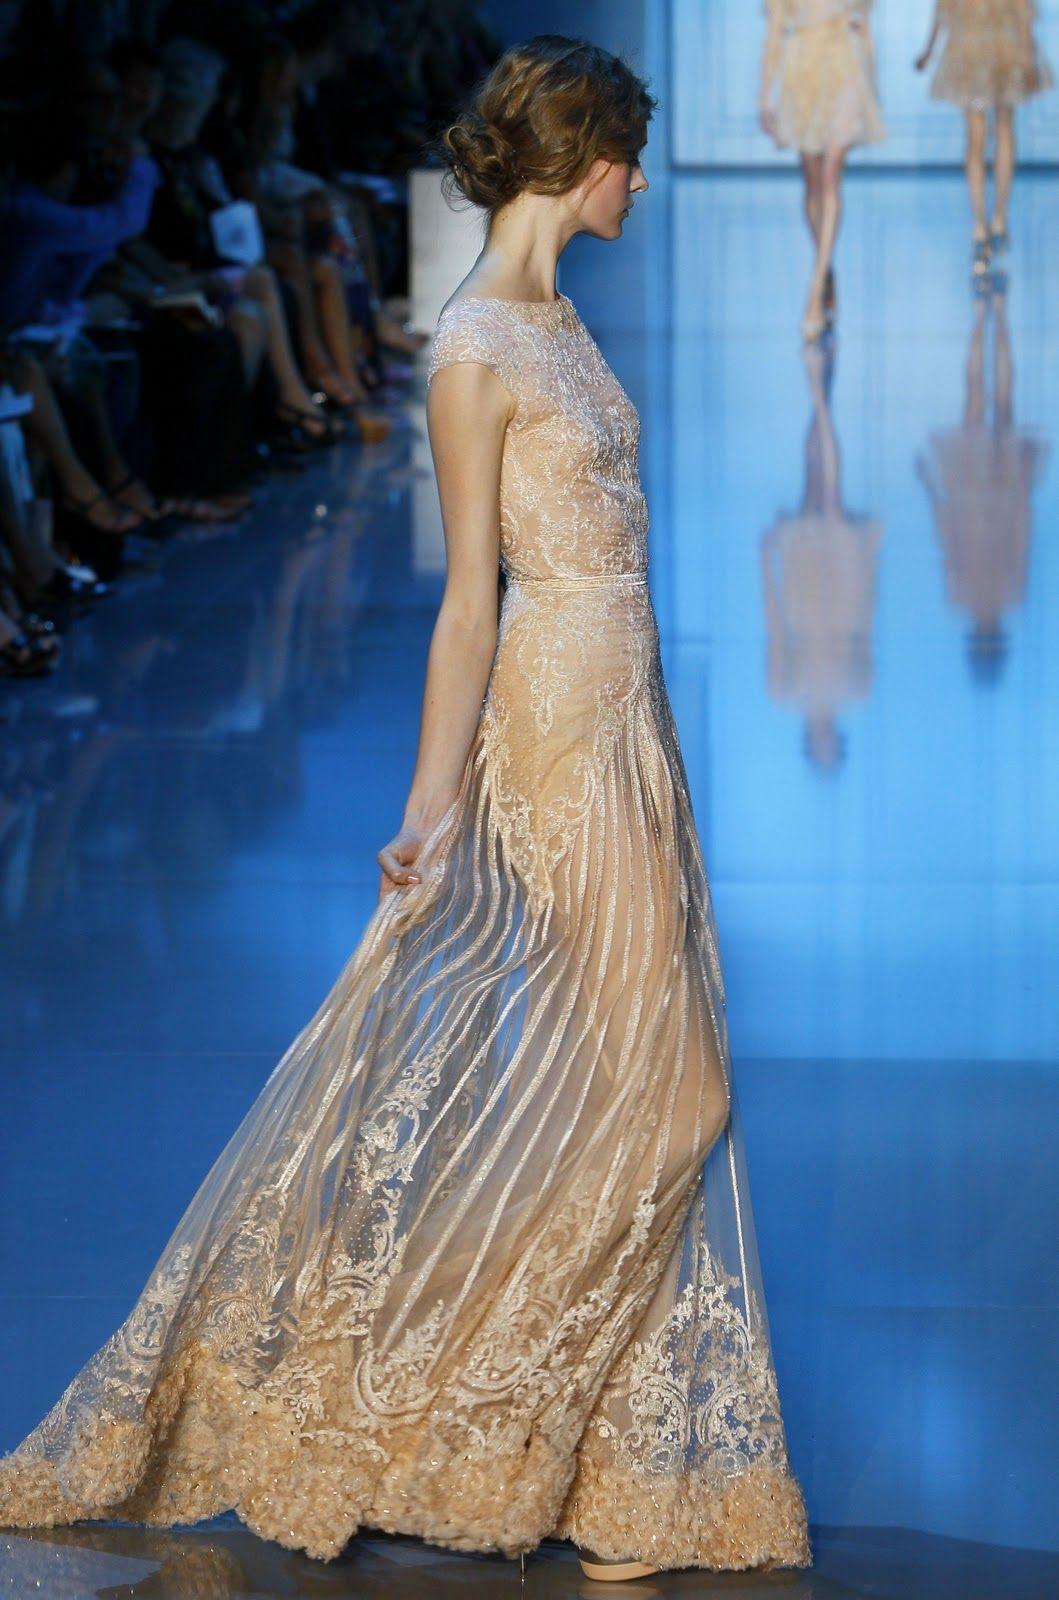 Peach gown elie saab wedding dress ideas pinterest peach